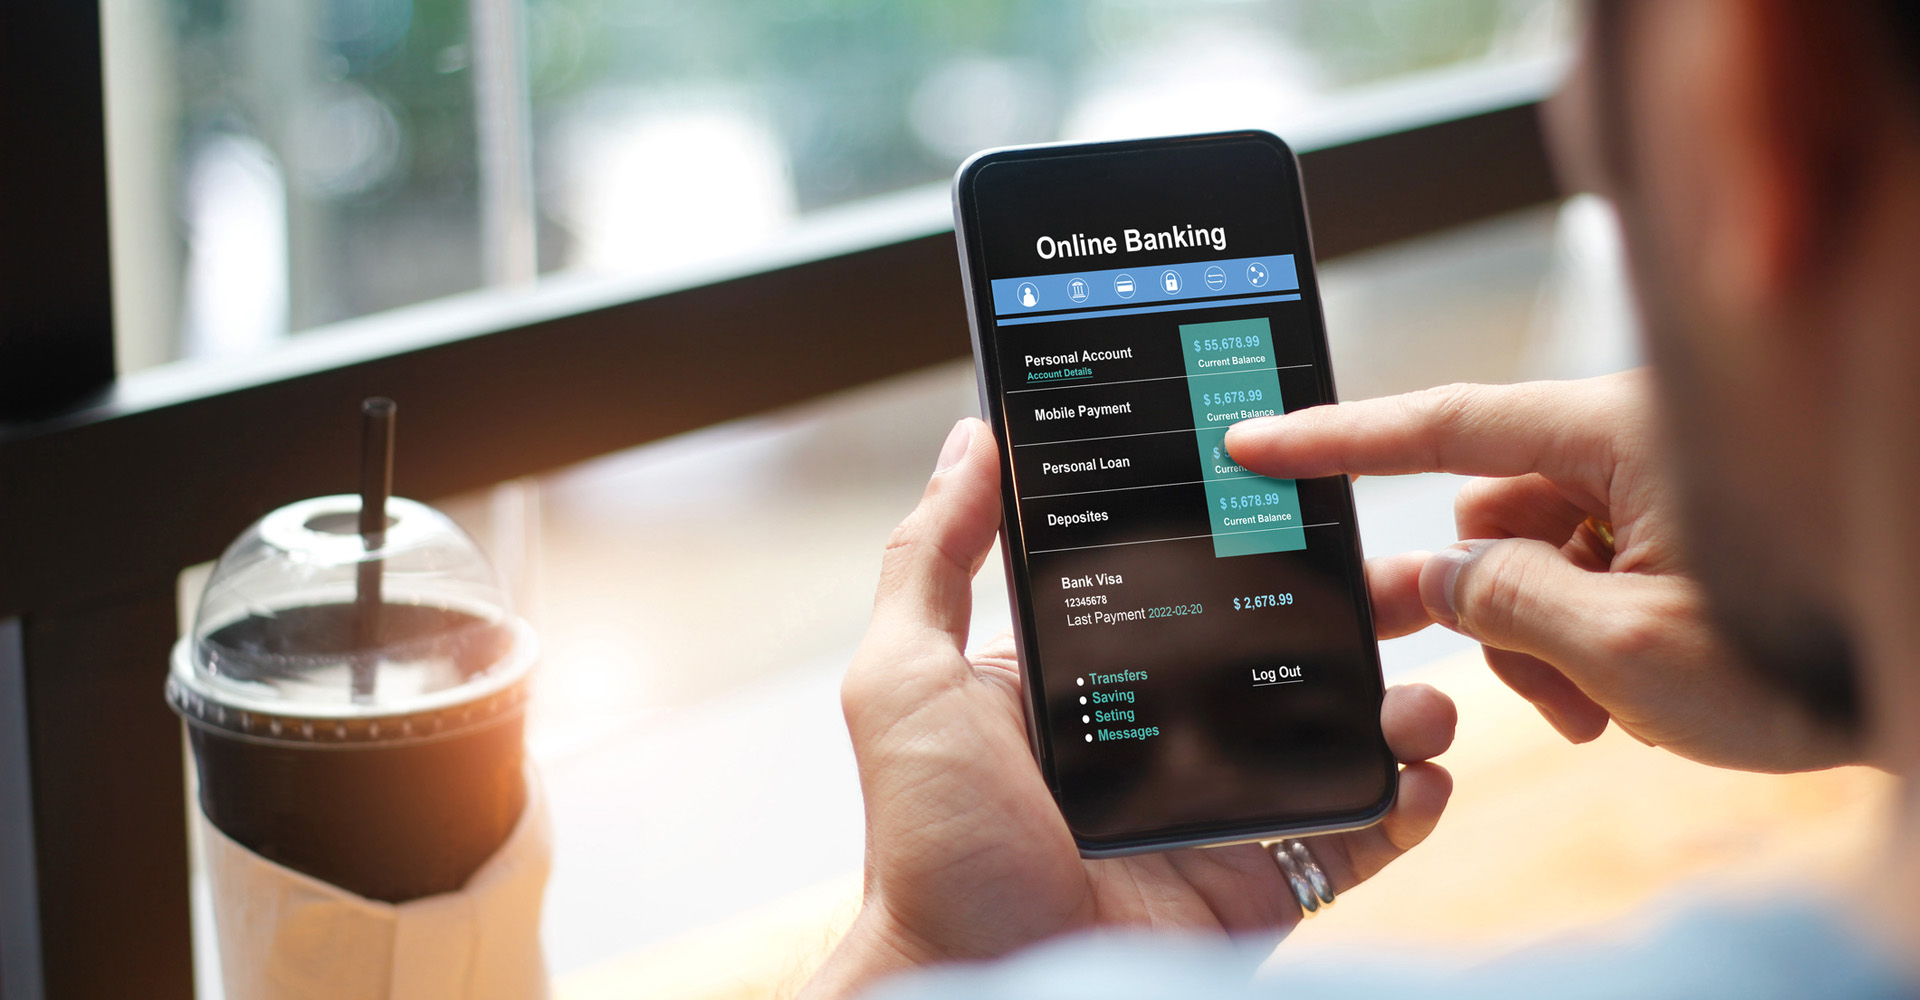 Online-Banking per Smartphone